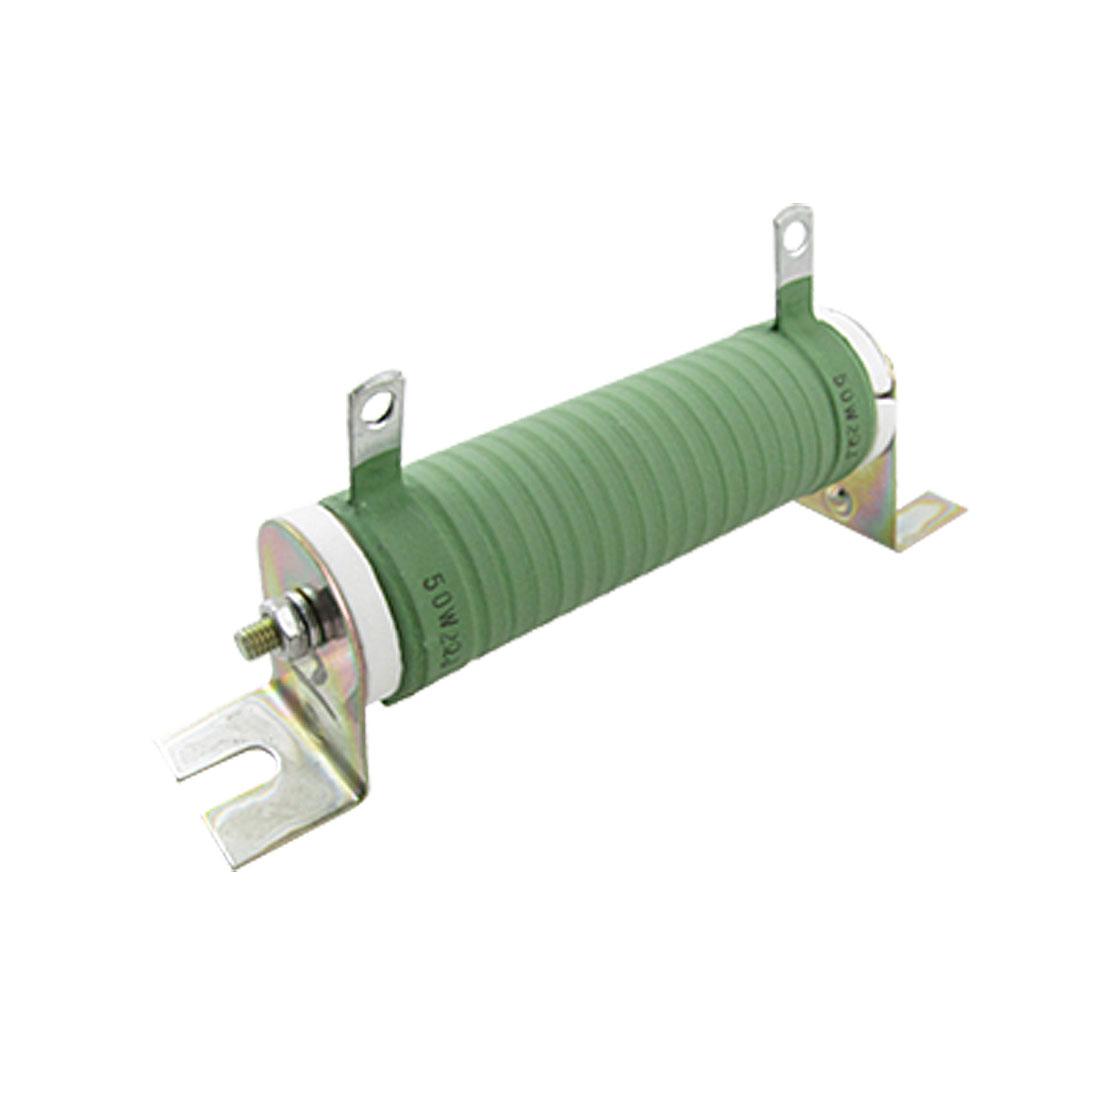 2 Ohm 50W Watt Wirewound Resistor Fixed Ceramic TubeResistor